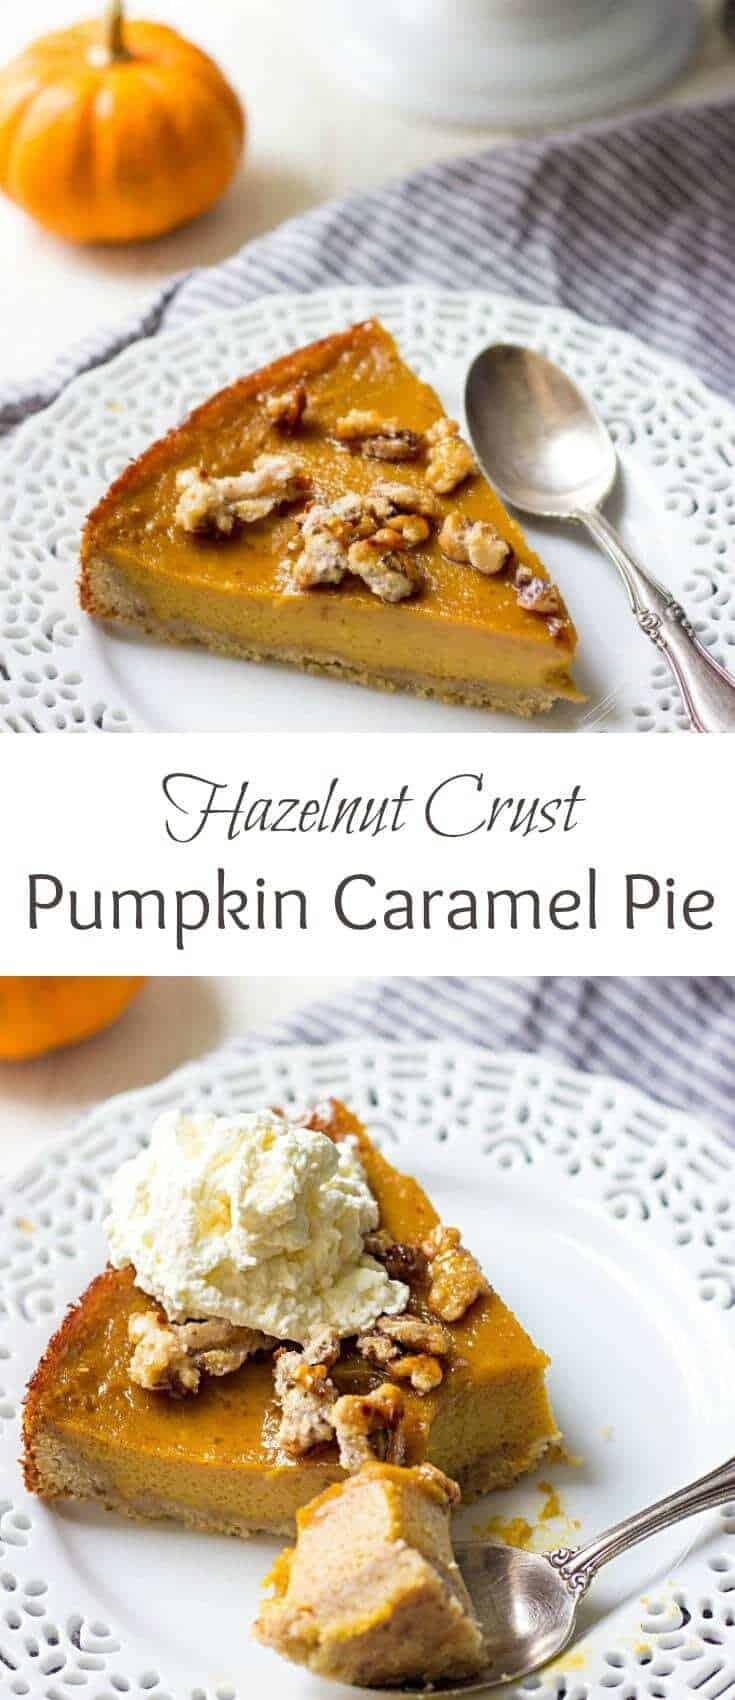 hazelnut-crust-pumpkin-caramel-pie